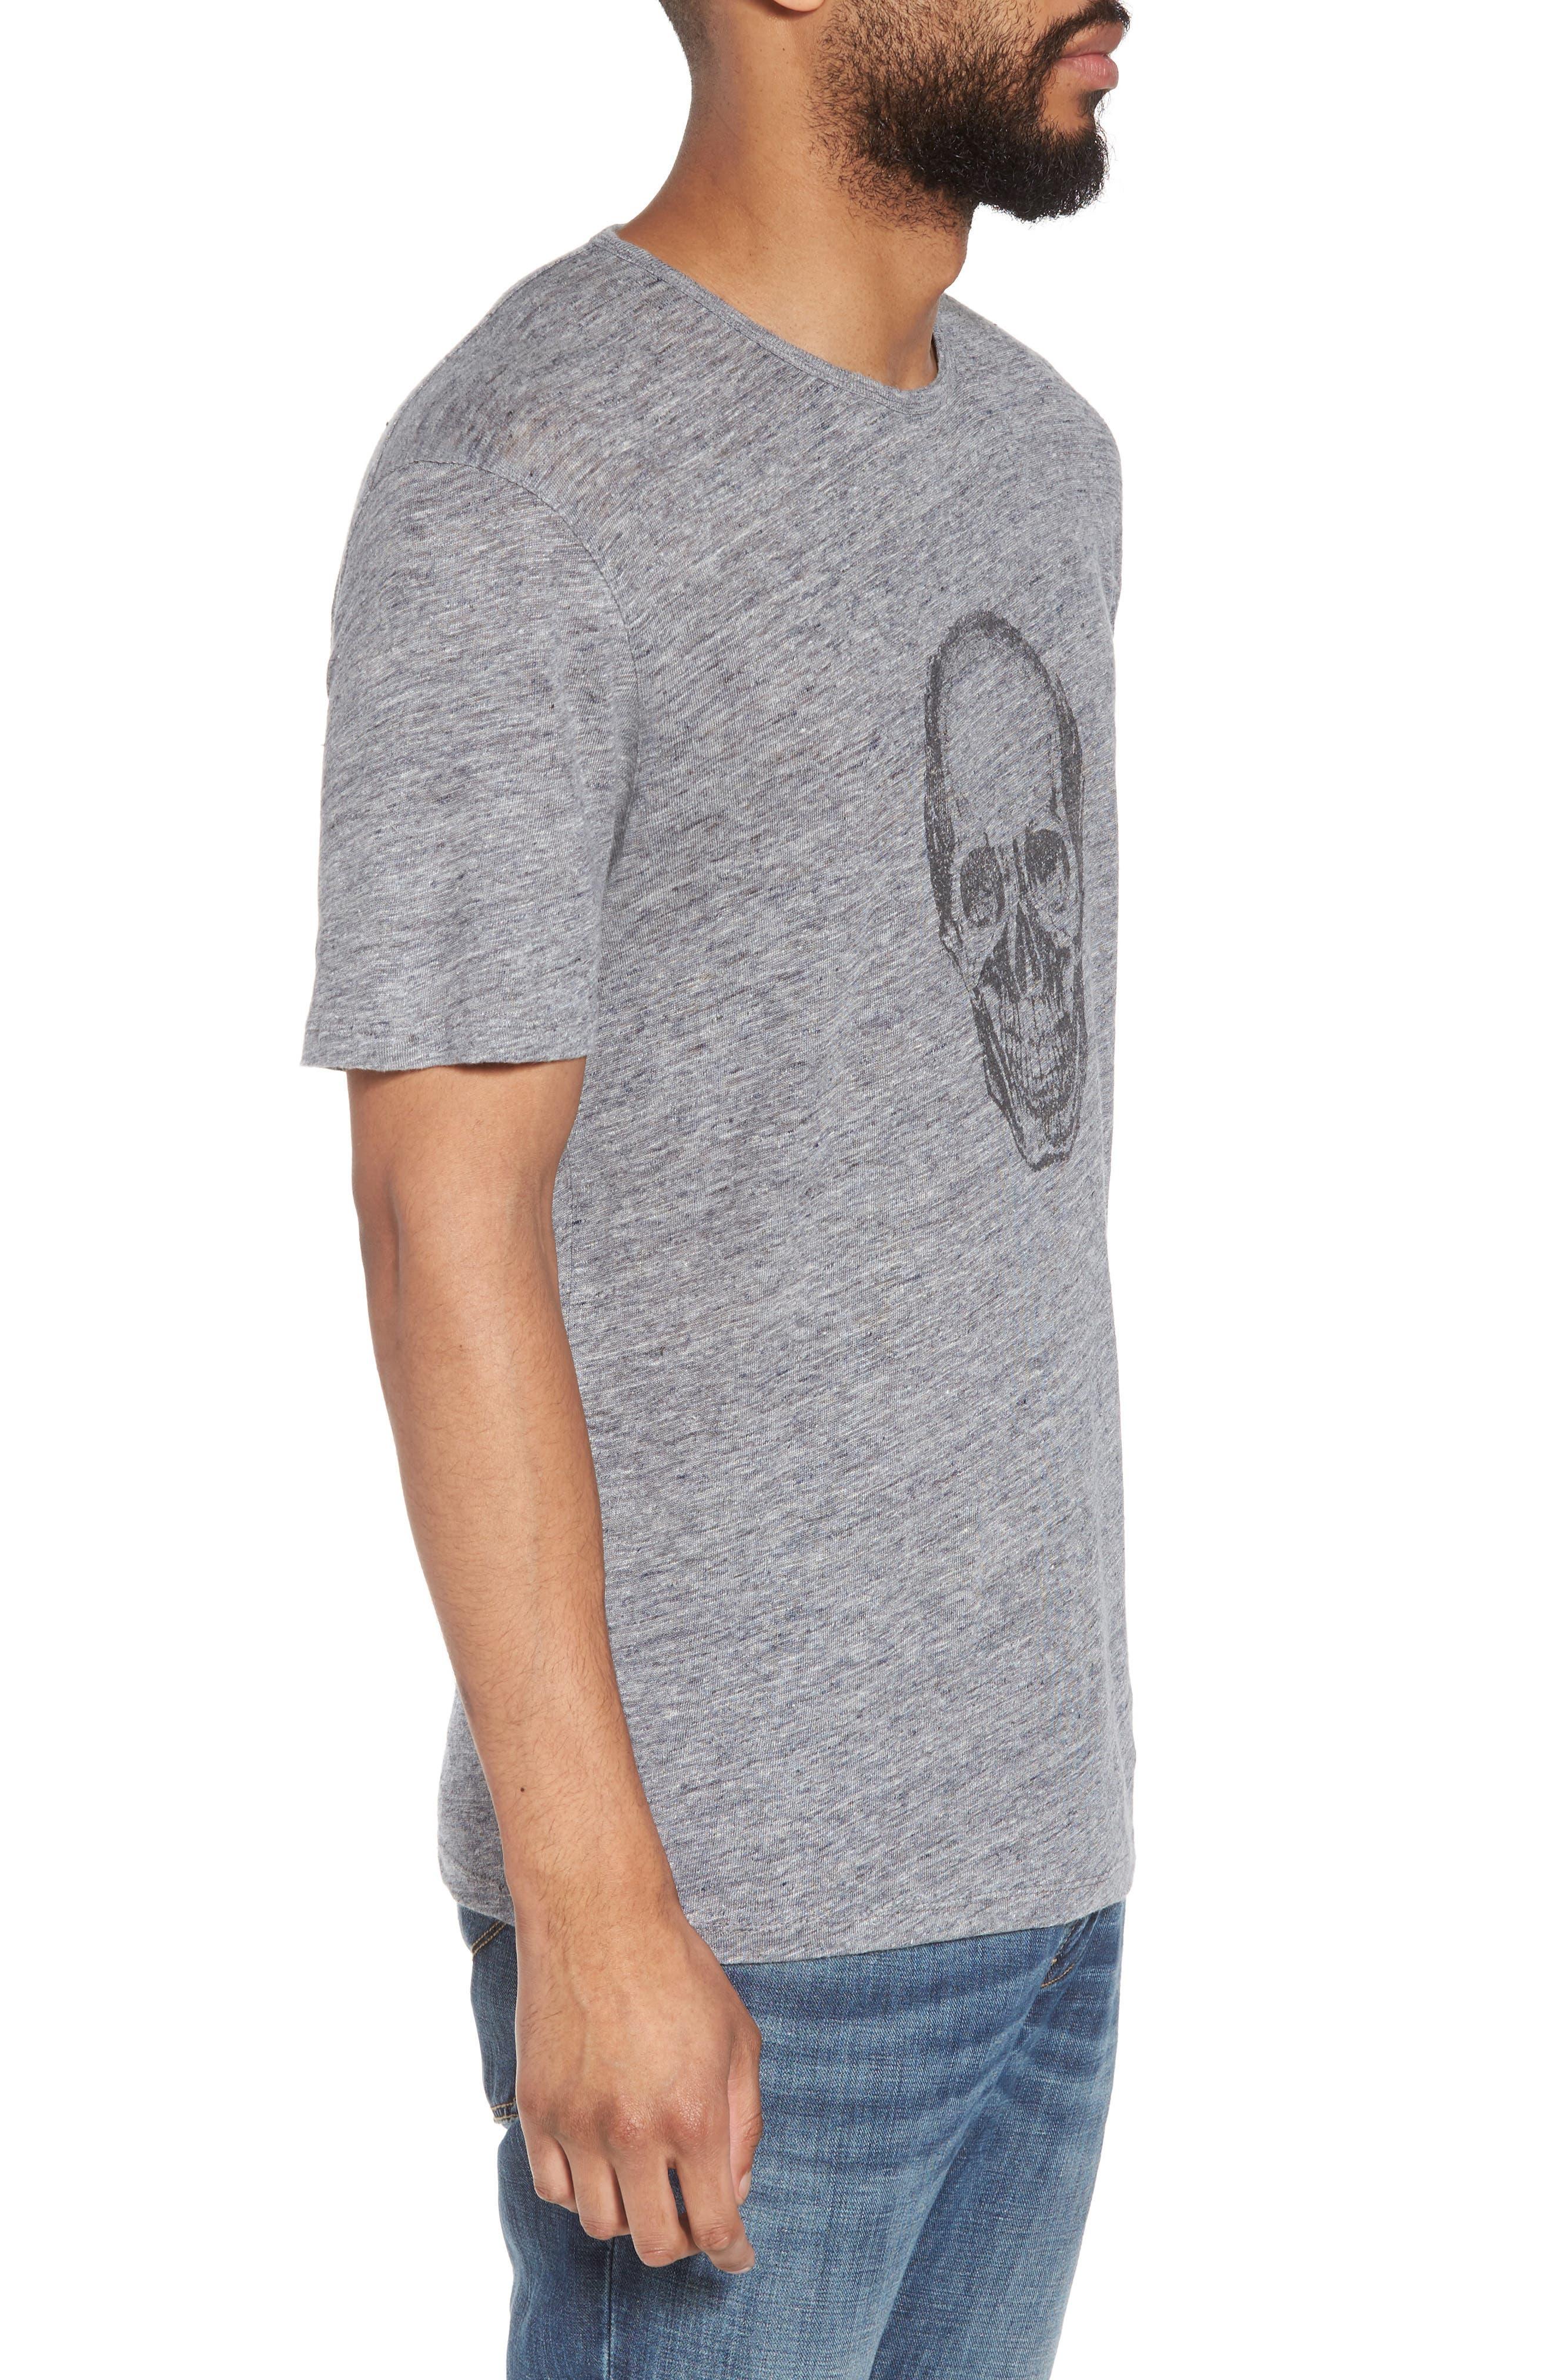 John Varvatos Crewneck Linen T-Shirt,                             Alternate thumbnail 3, color,                             Med Grey